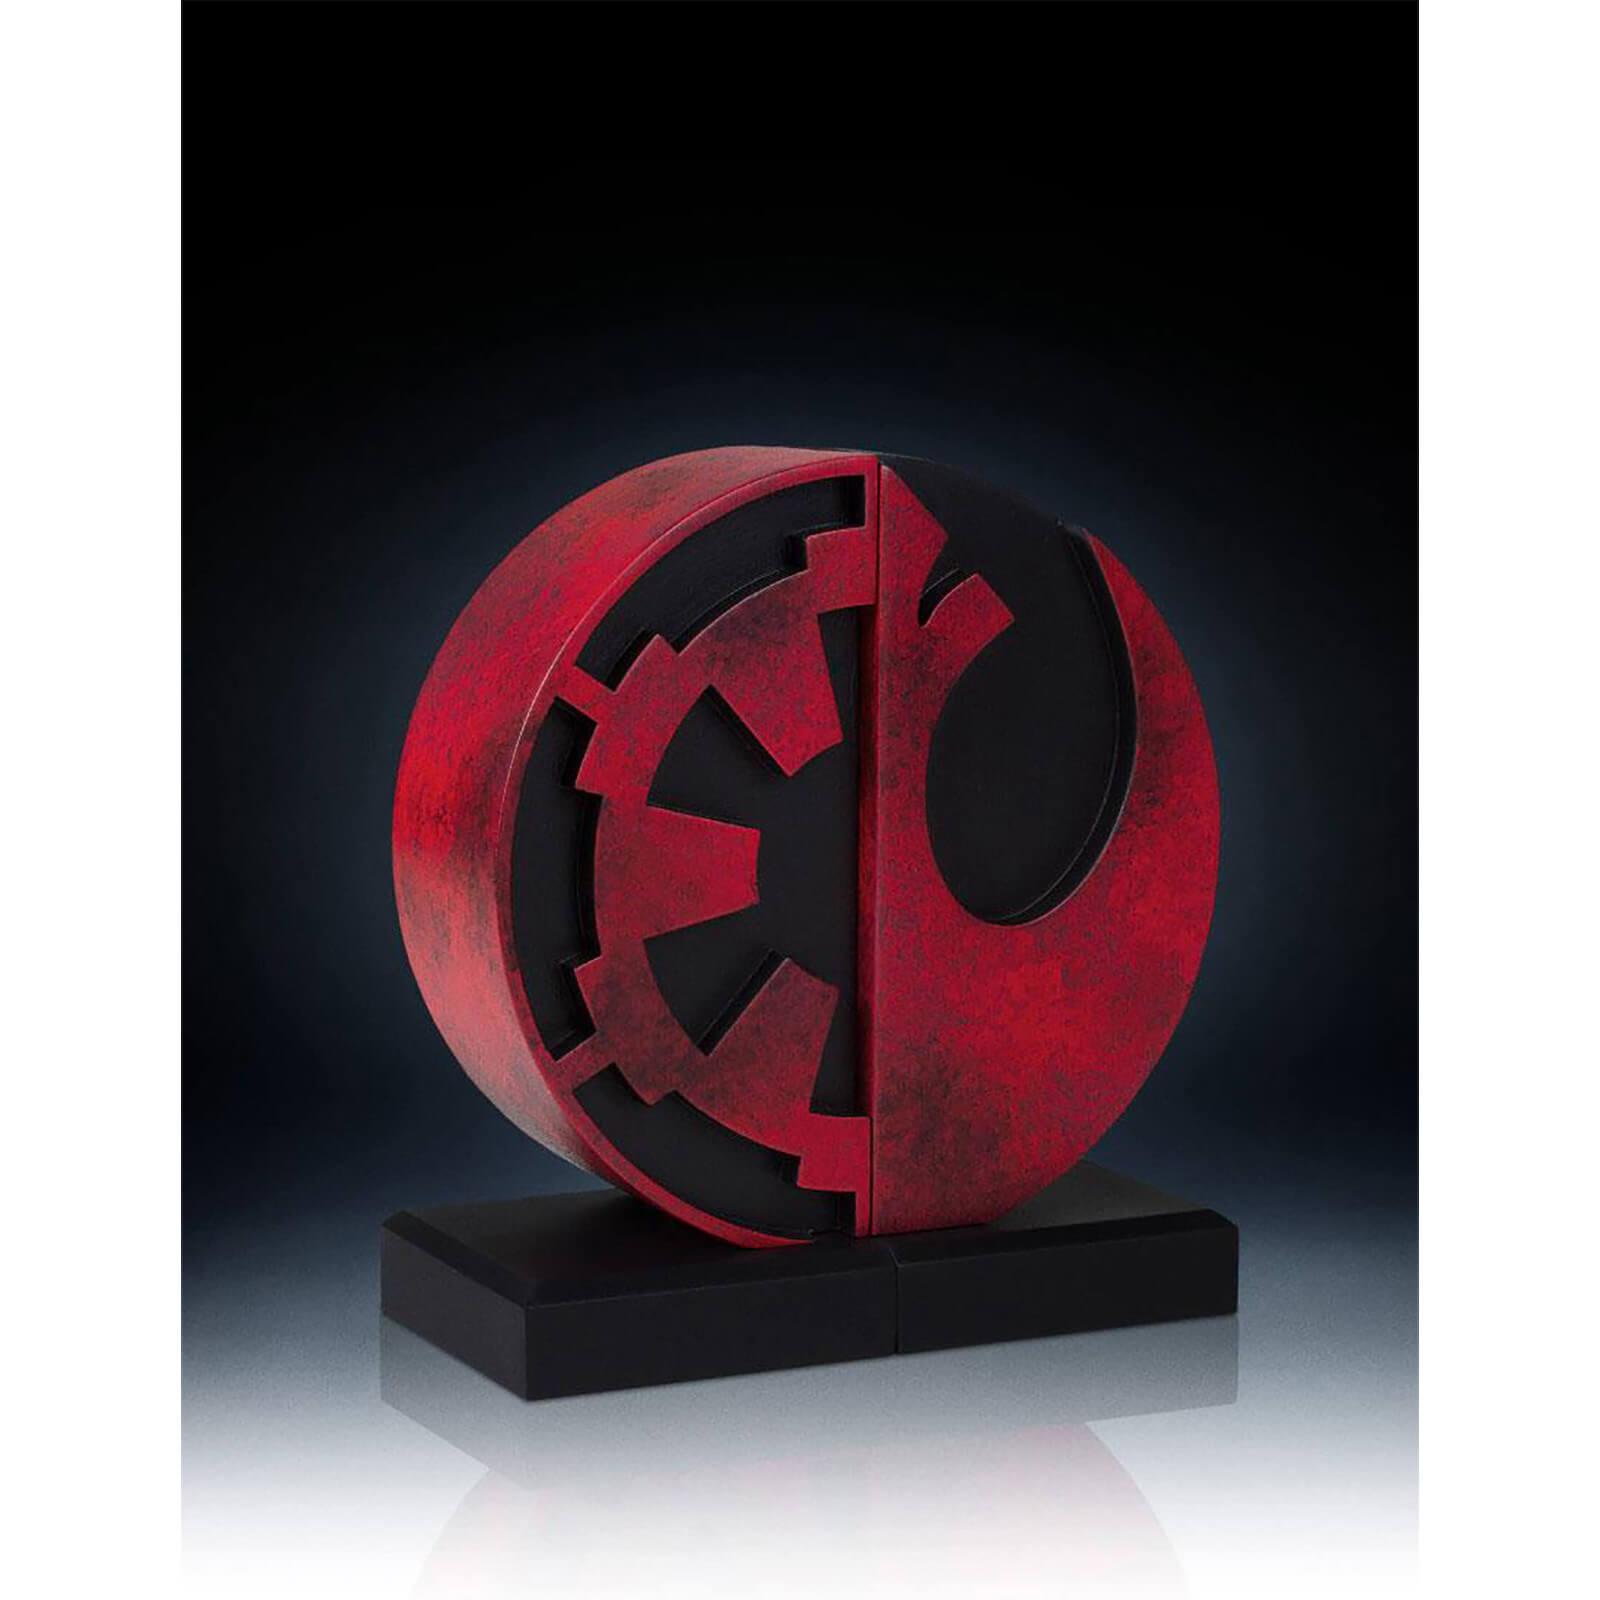 Gentle giant star wars bookends imperial rebel logo 15 cm merchandise zavvi